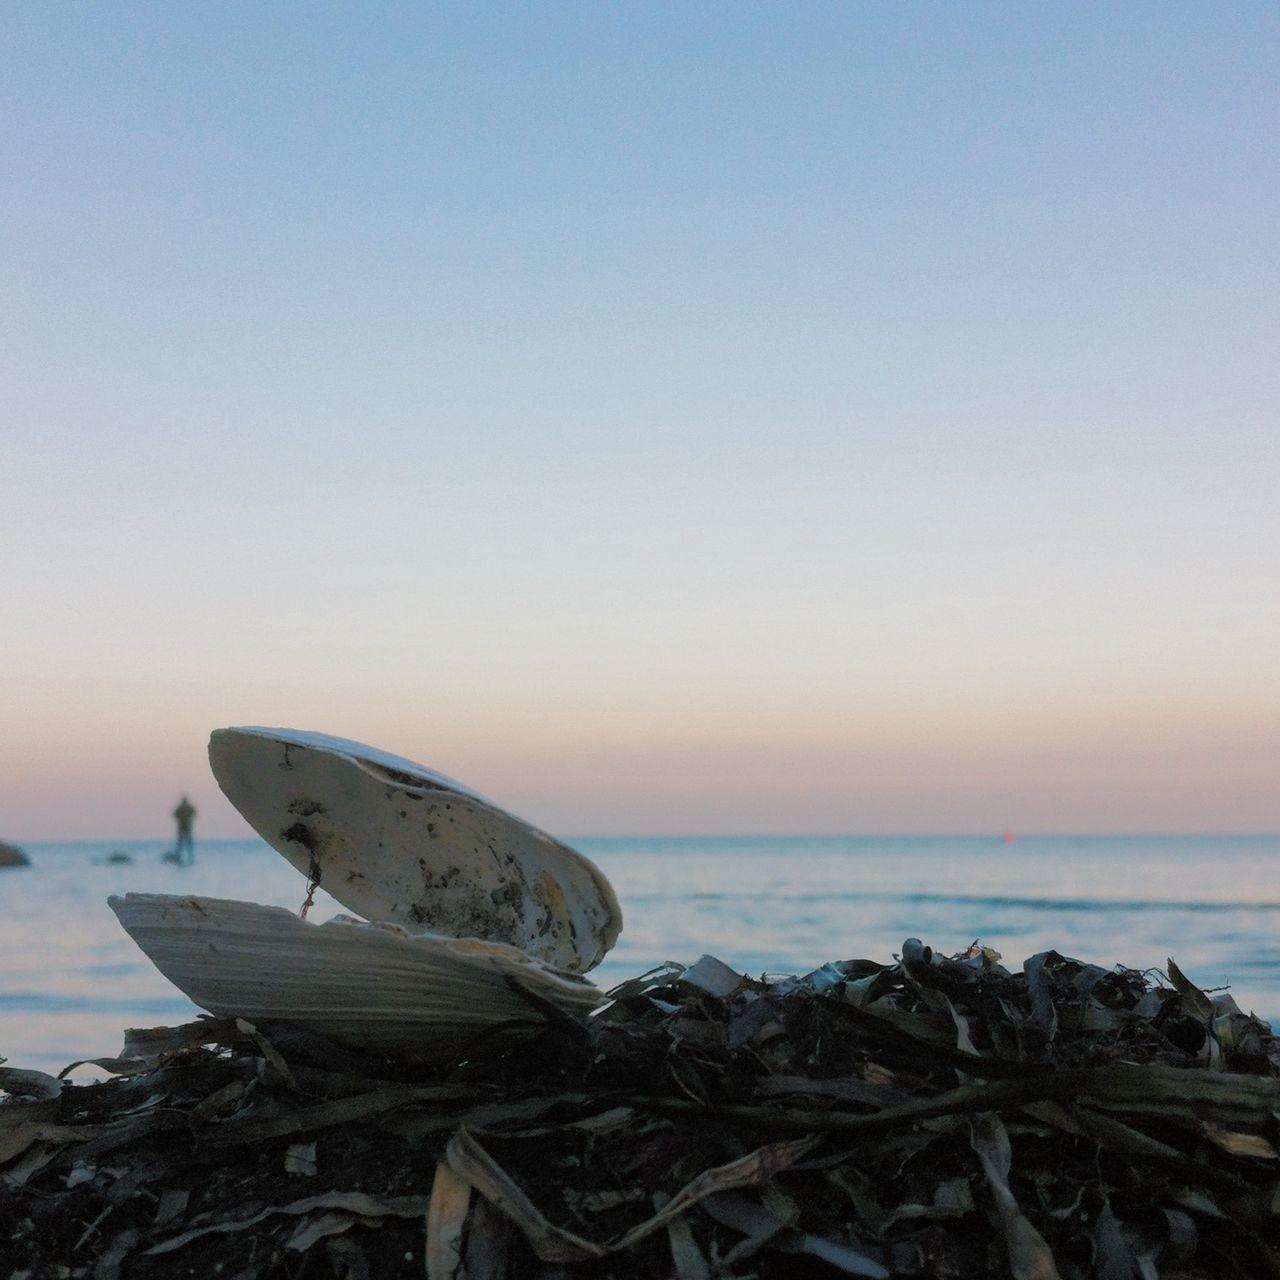 Sea shell Ocean Landscape Sunset Nature